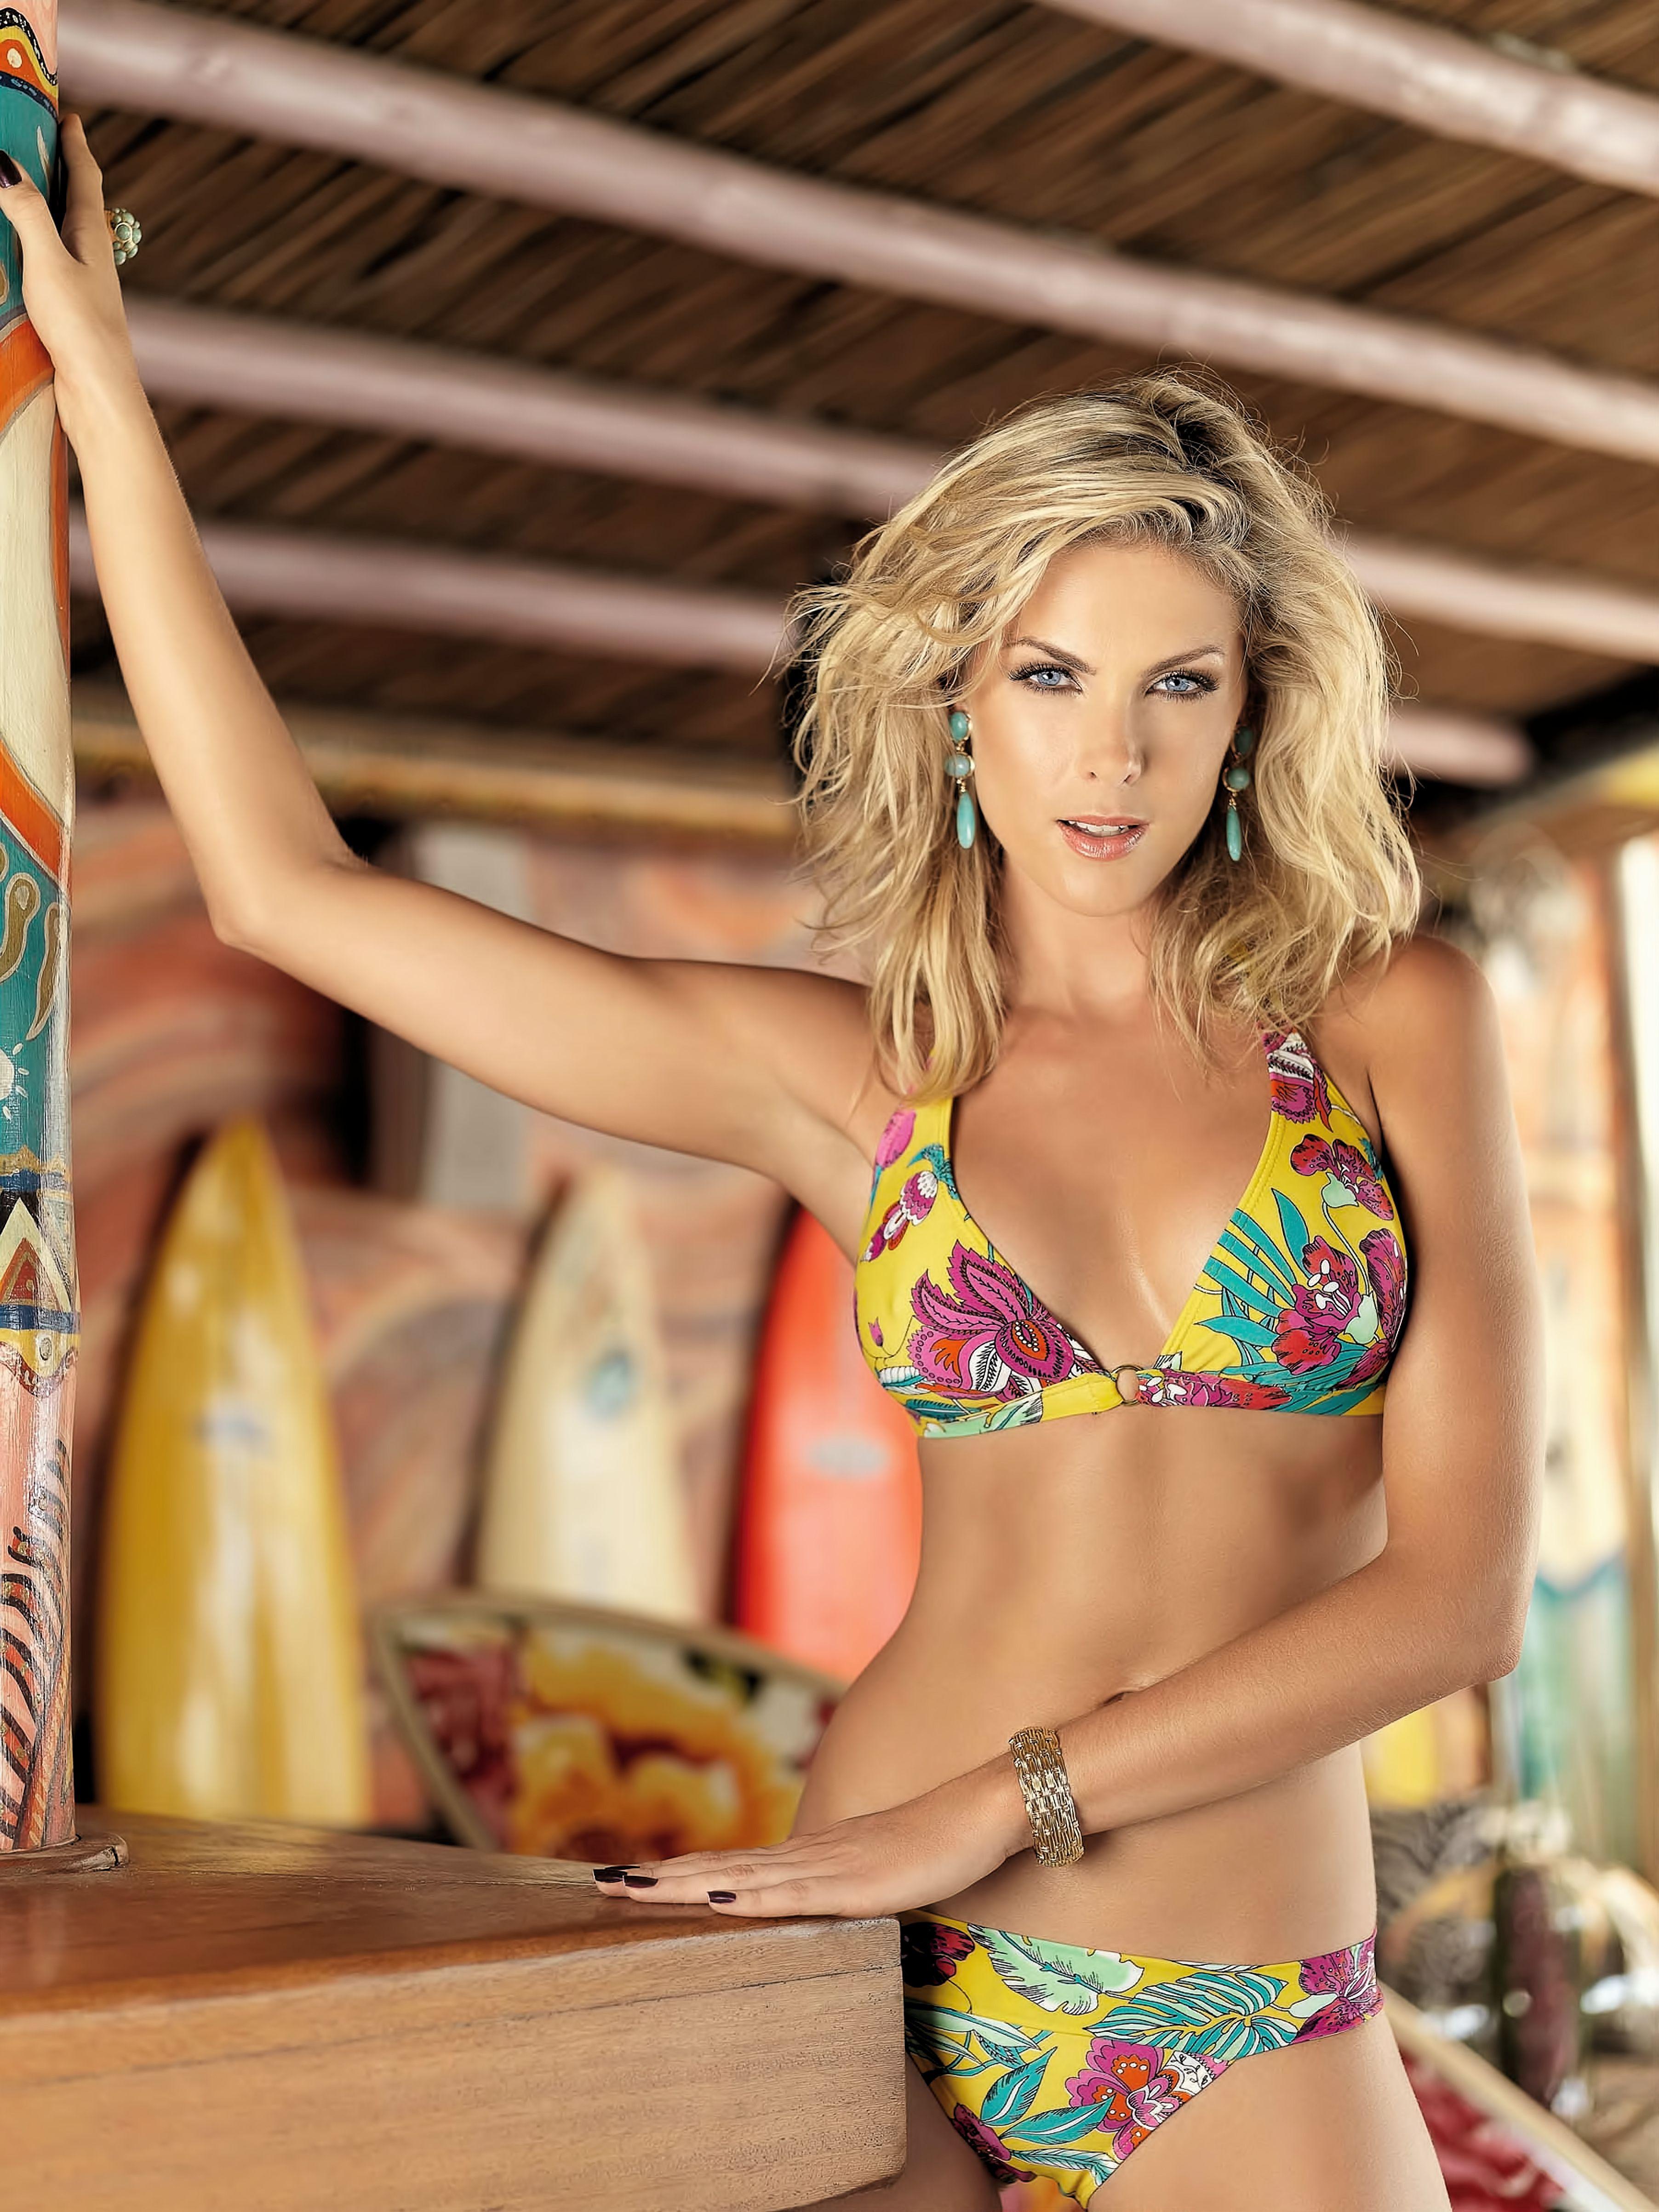 Boobs Sexy Ana Hickmann 12002  nudes (29 pictures), Facebook, in bikini